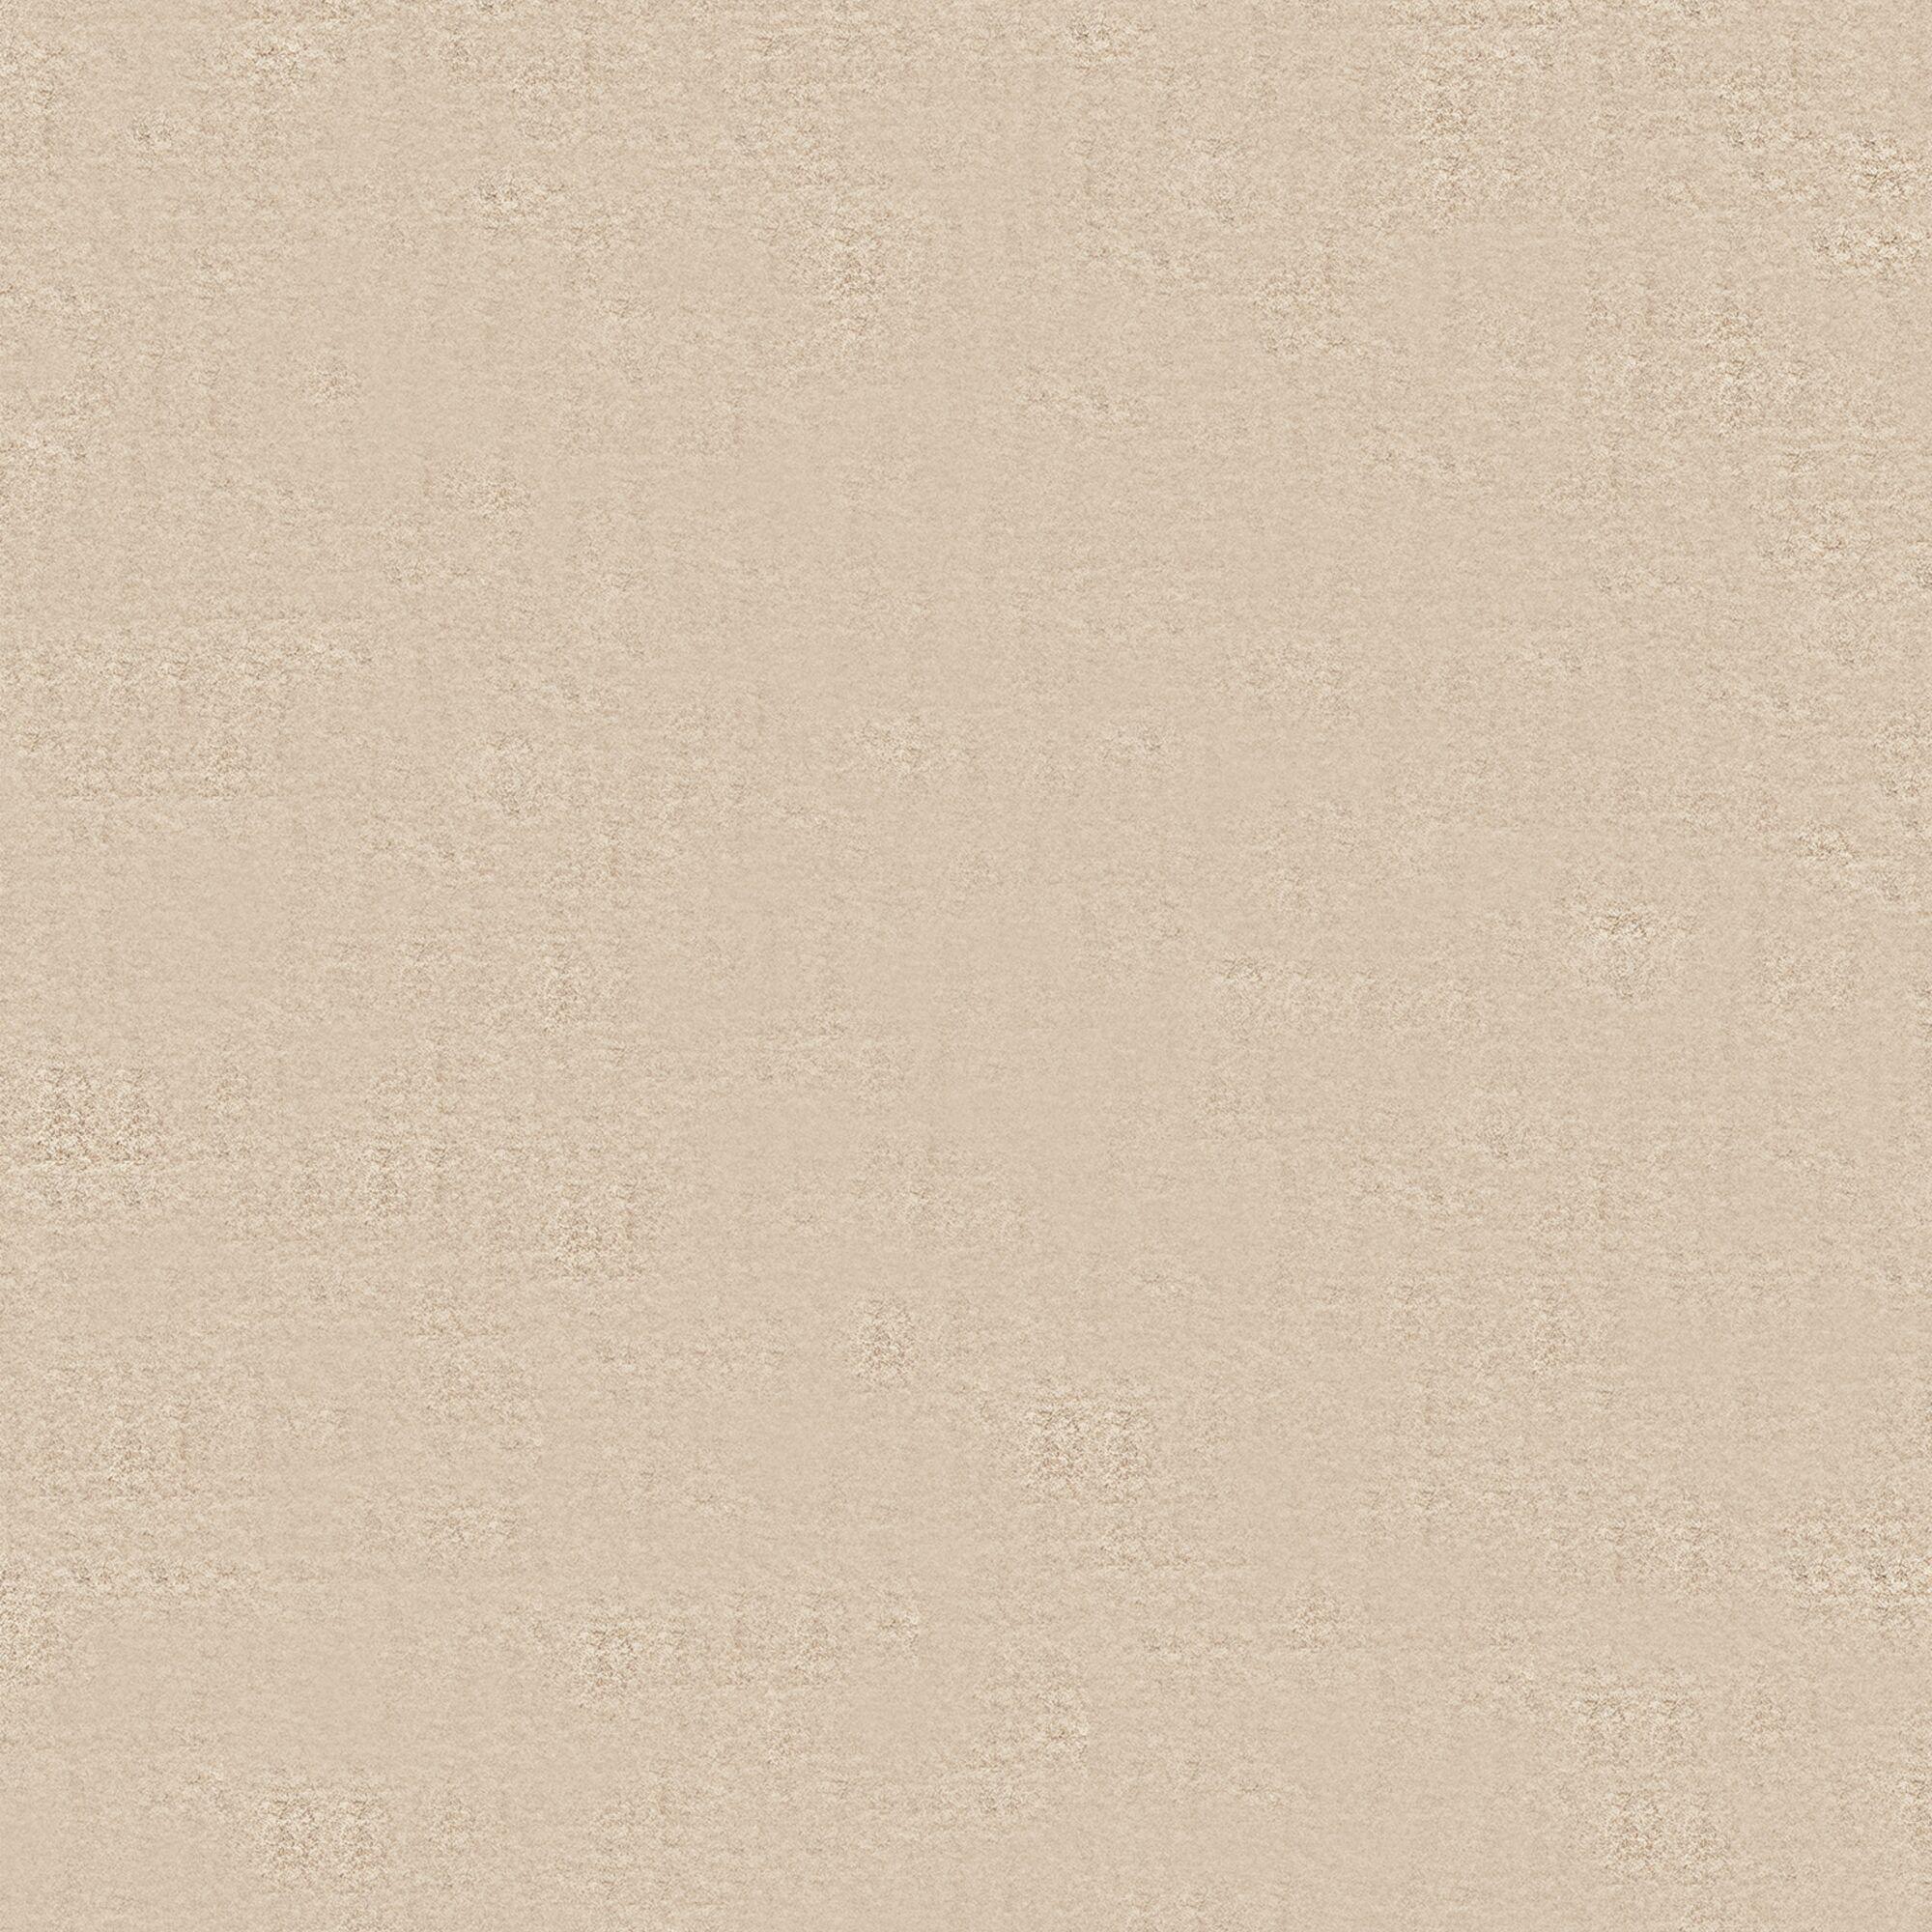 Rangel Butter Cream Area Rug Rug Size: Square 7' 10